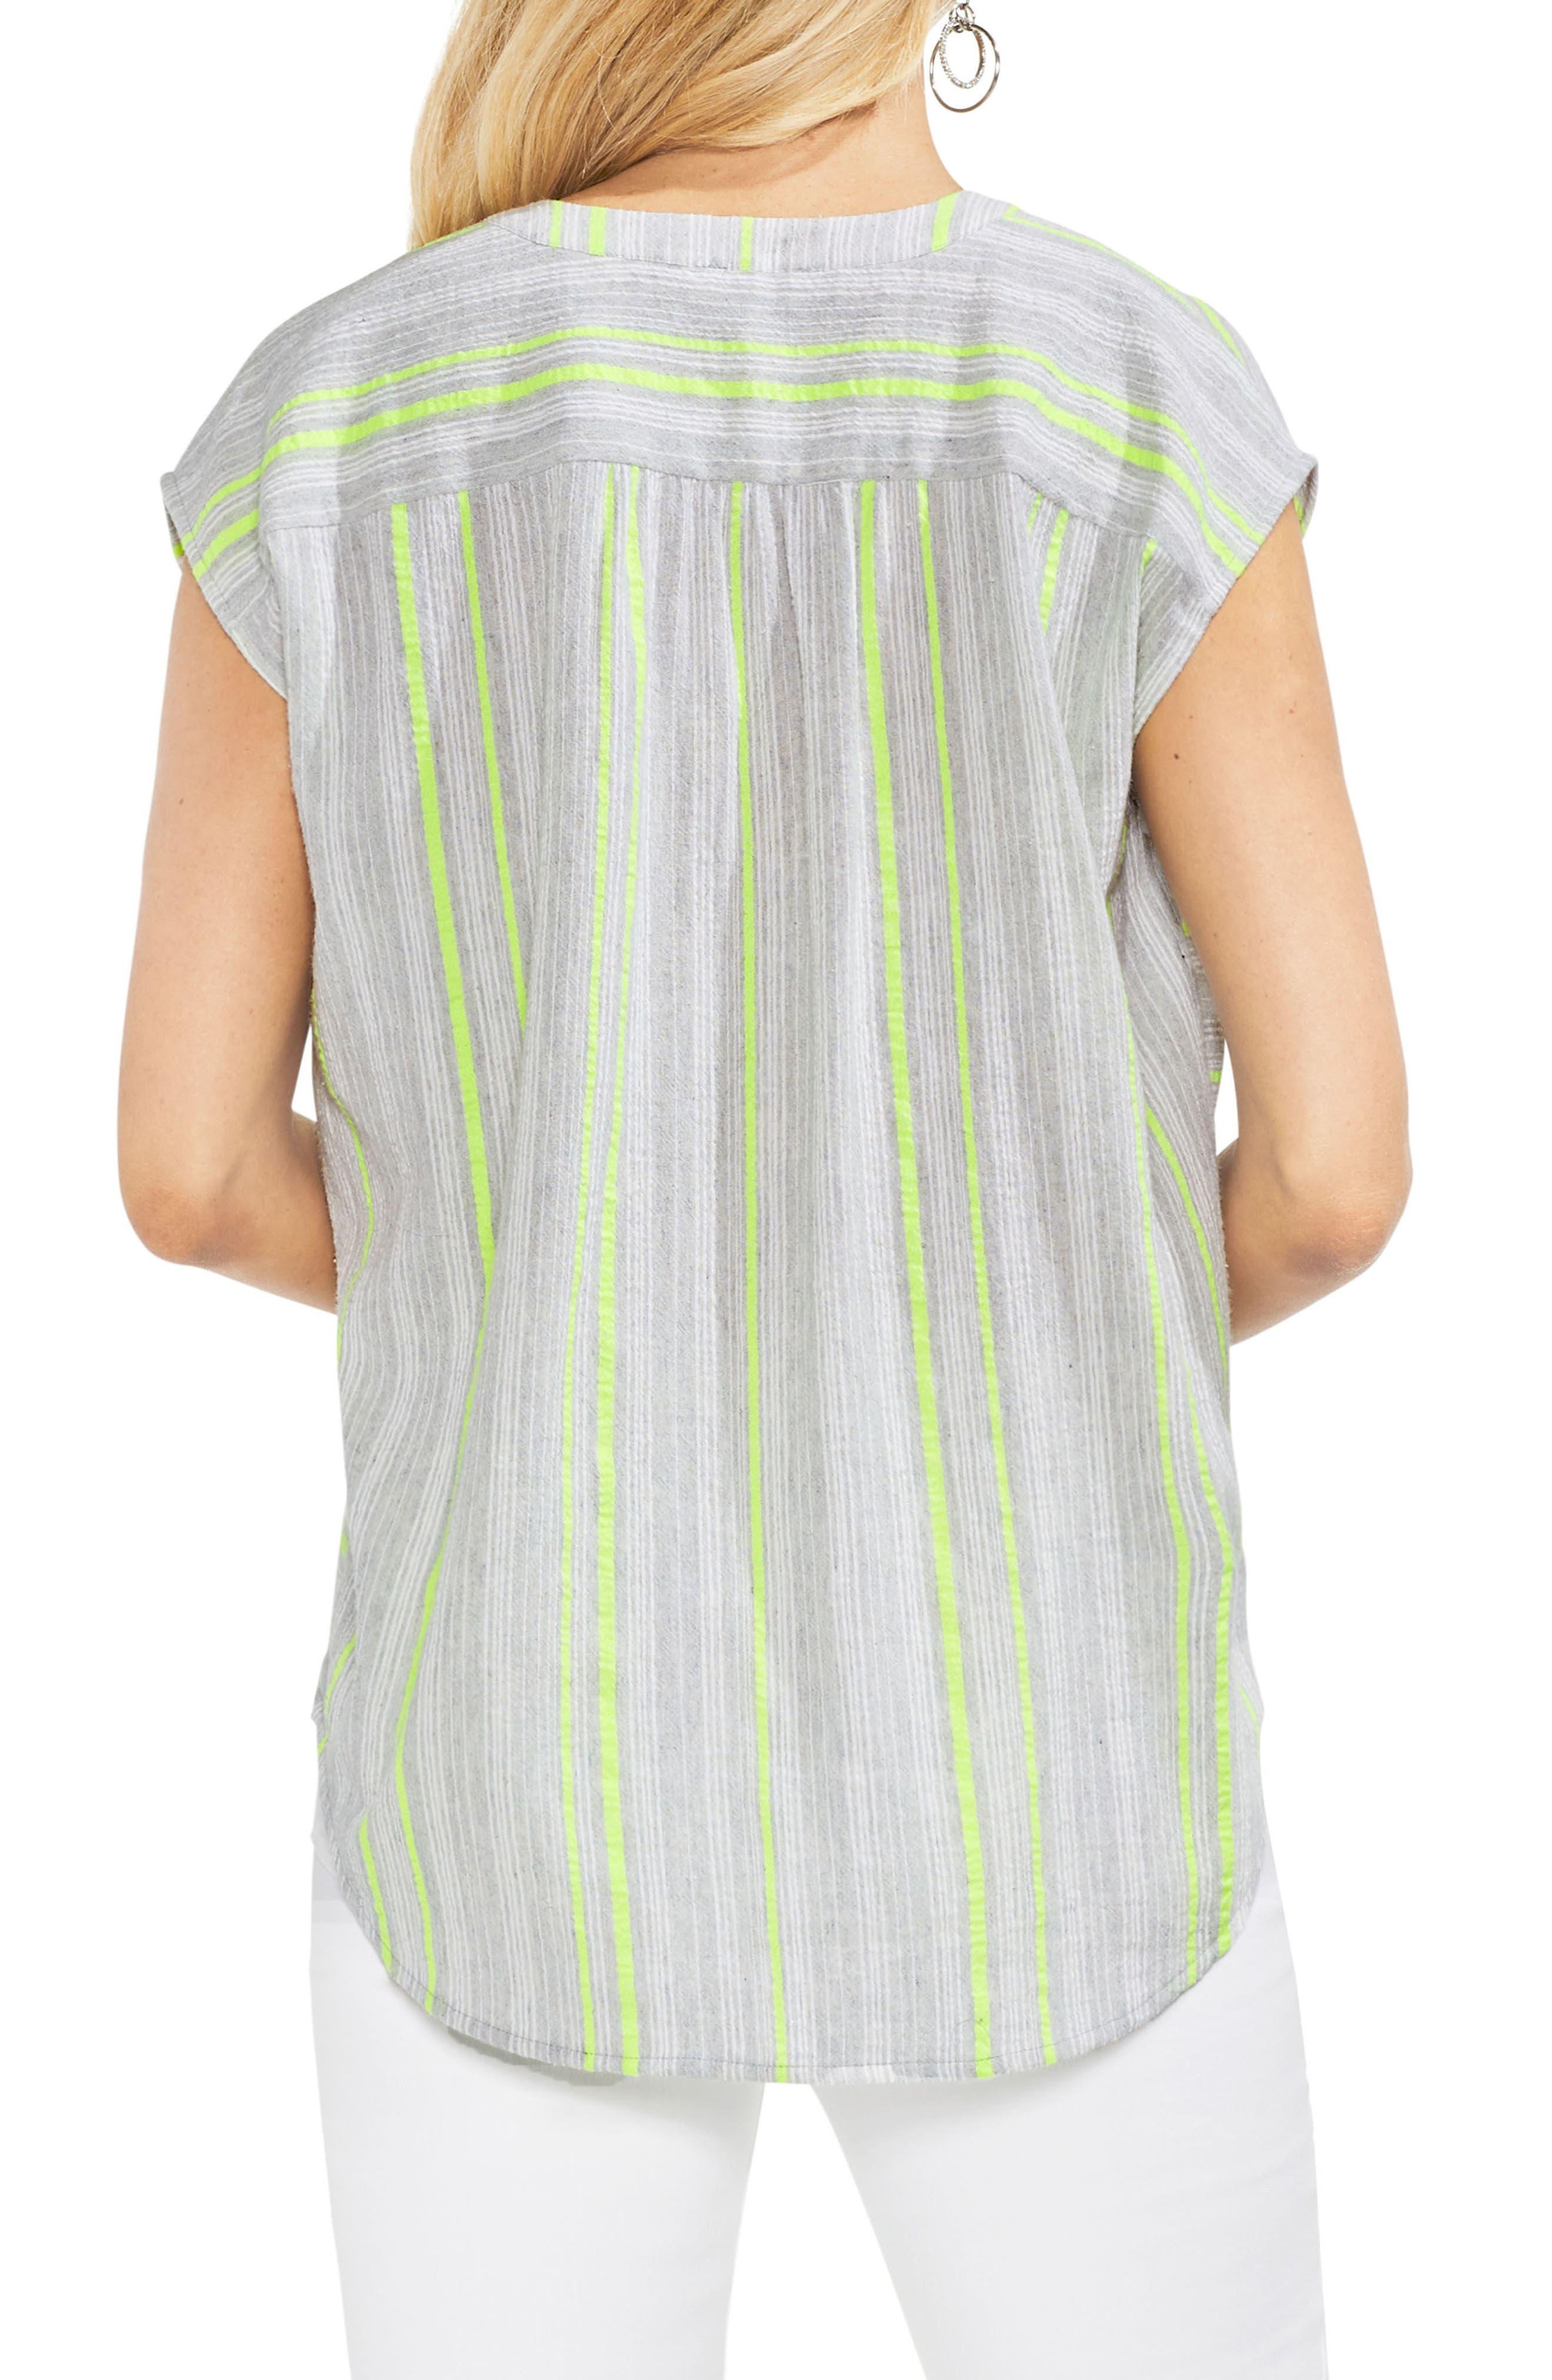 Cotton Blend Stripe Henley Top,                             Alternate thumbnail 2, color,                             Island Lime